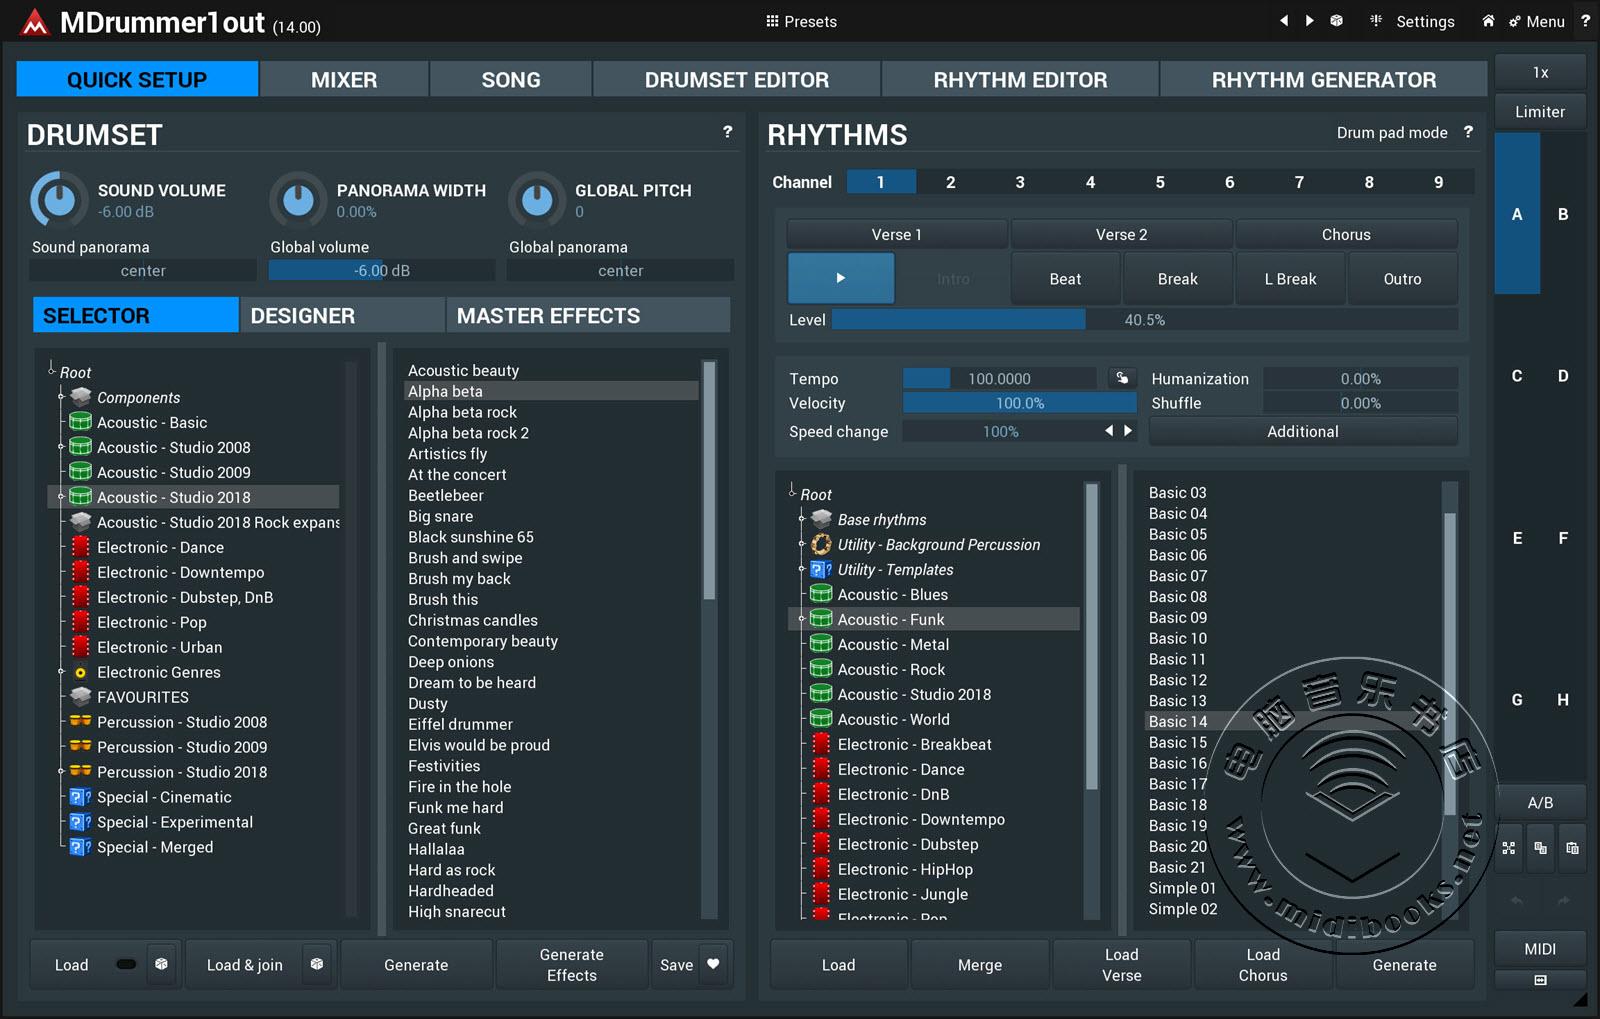 MeldaProduction 发布高达60GB的免费打击乐音色扩展包 Drum Empire 2020(视频)